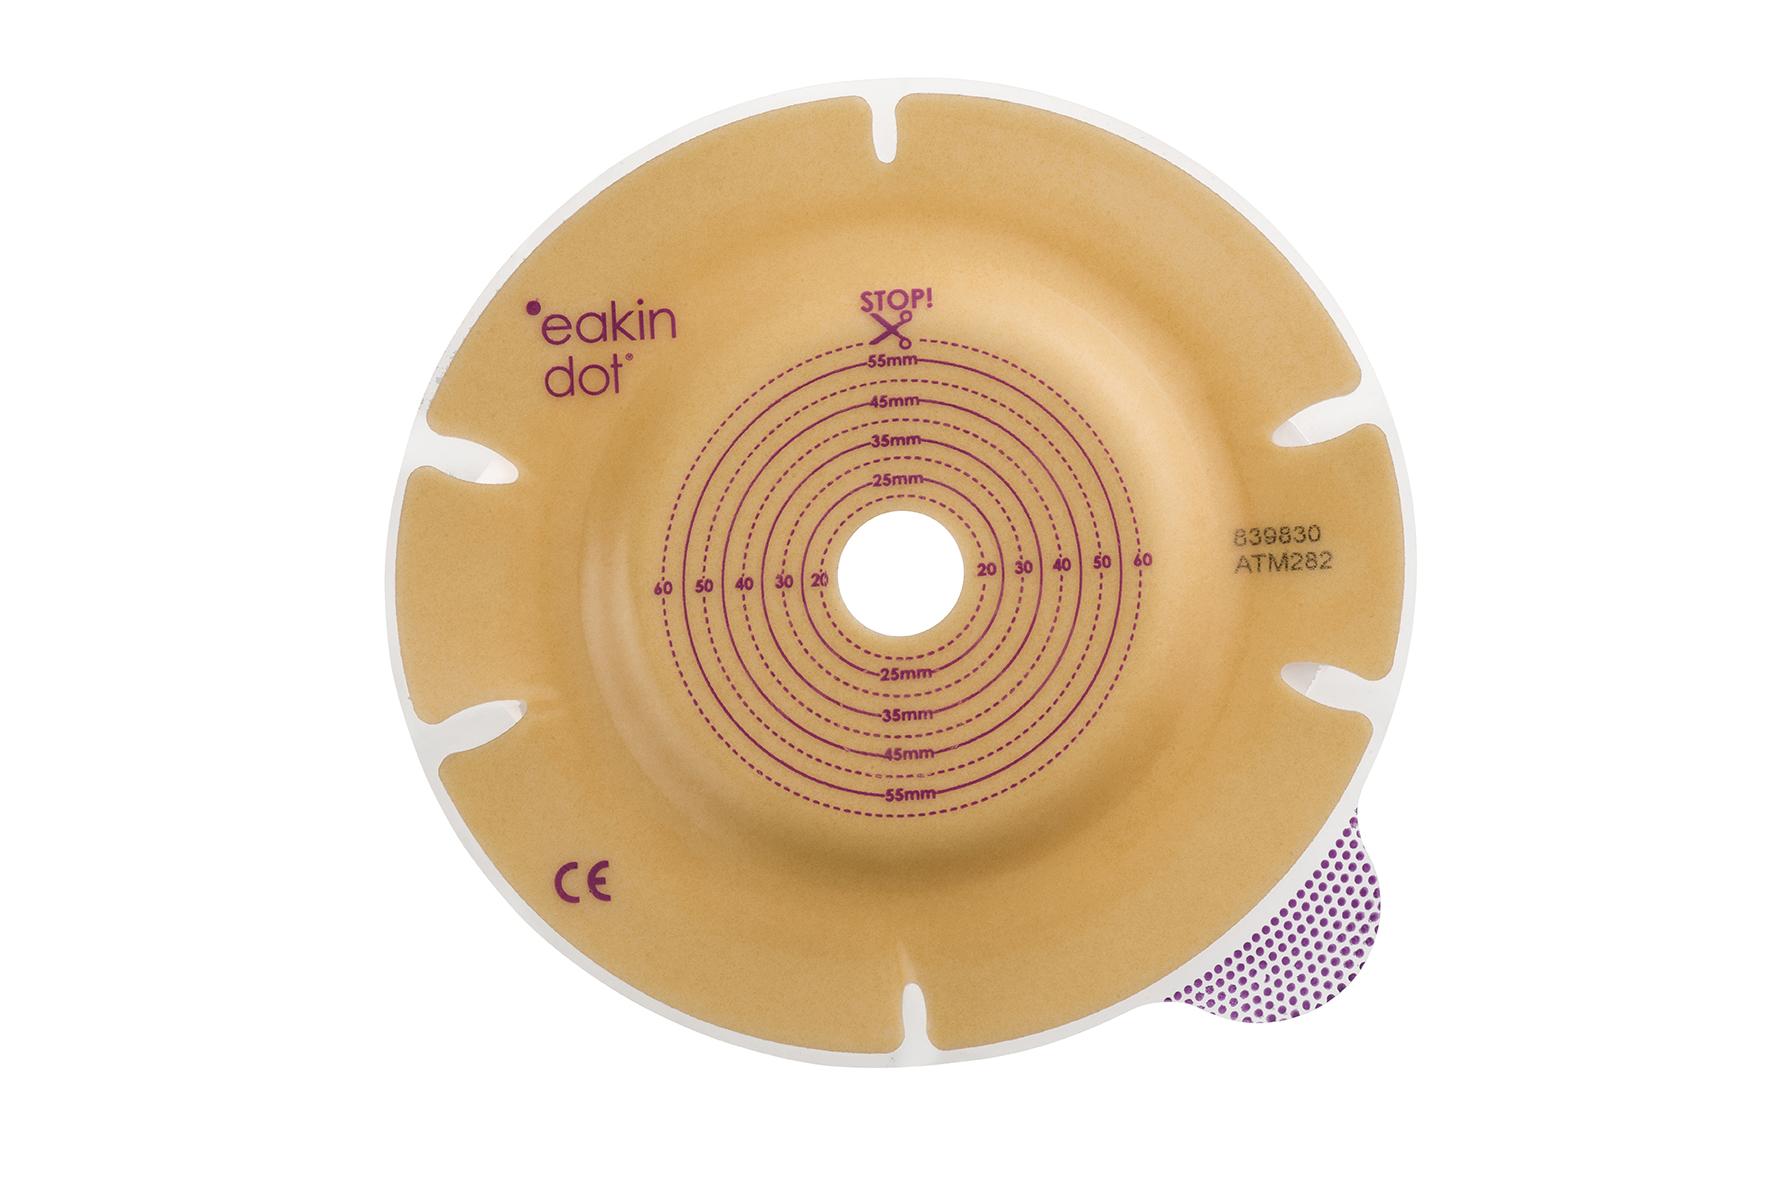 839830 Eakin dor 2-dels blød convex_ krops side_ LR